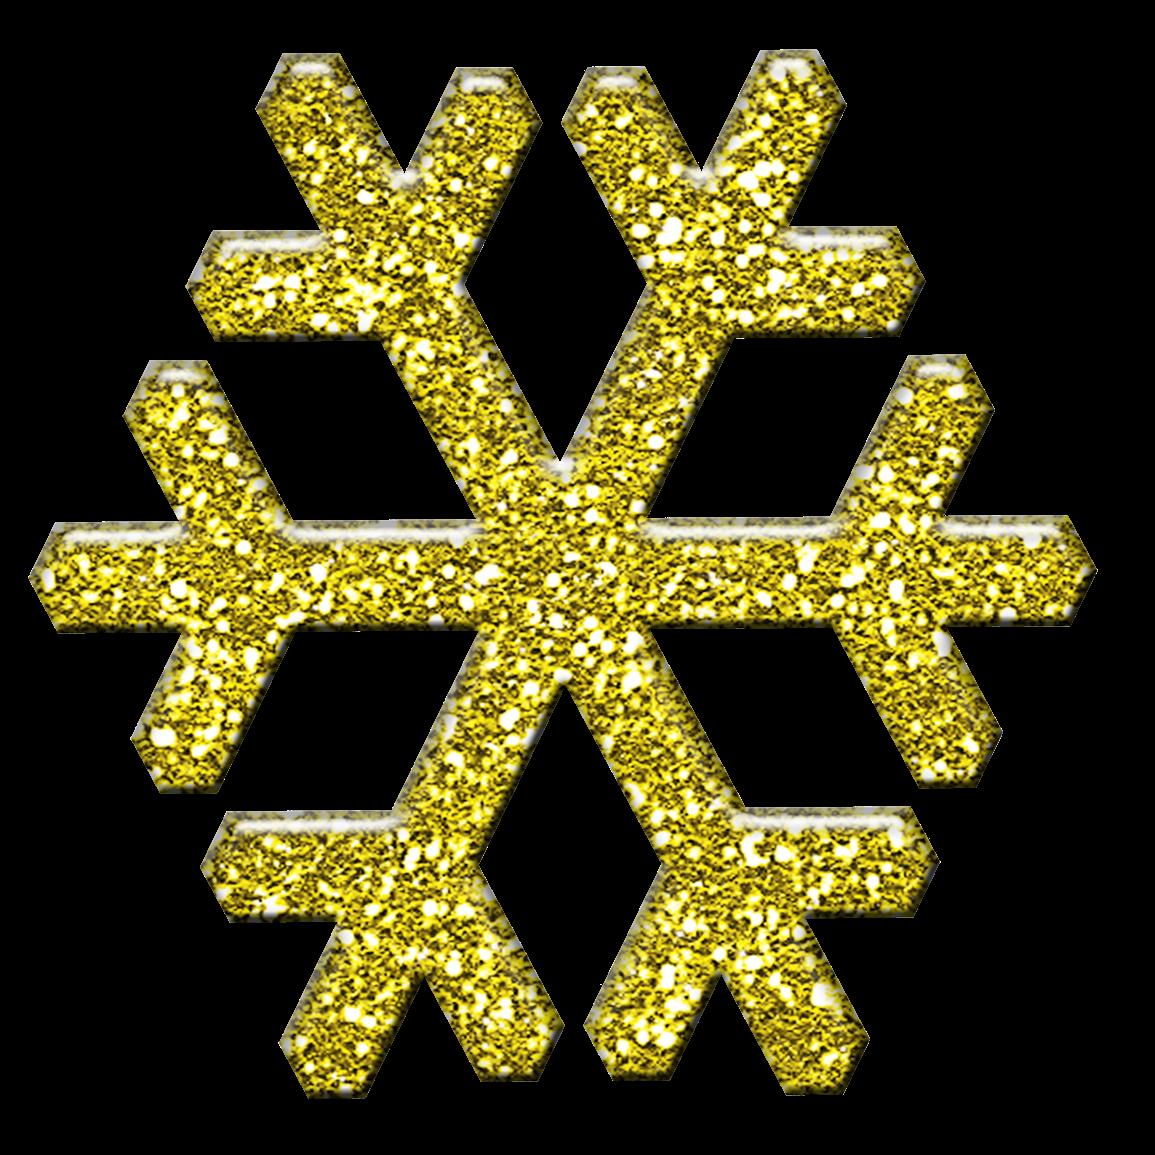 Snowflake clipart yellow. Free christmas scrapbooking goodies